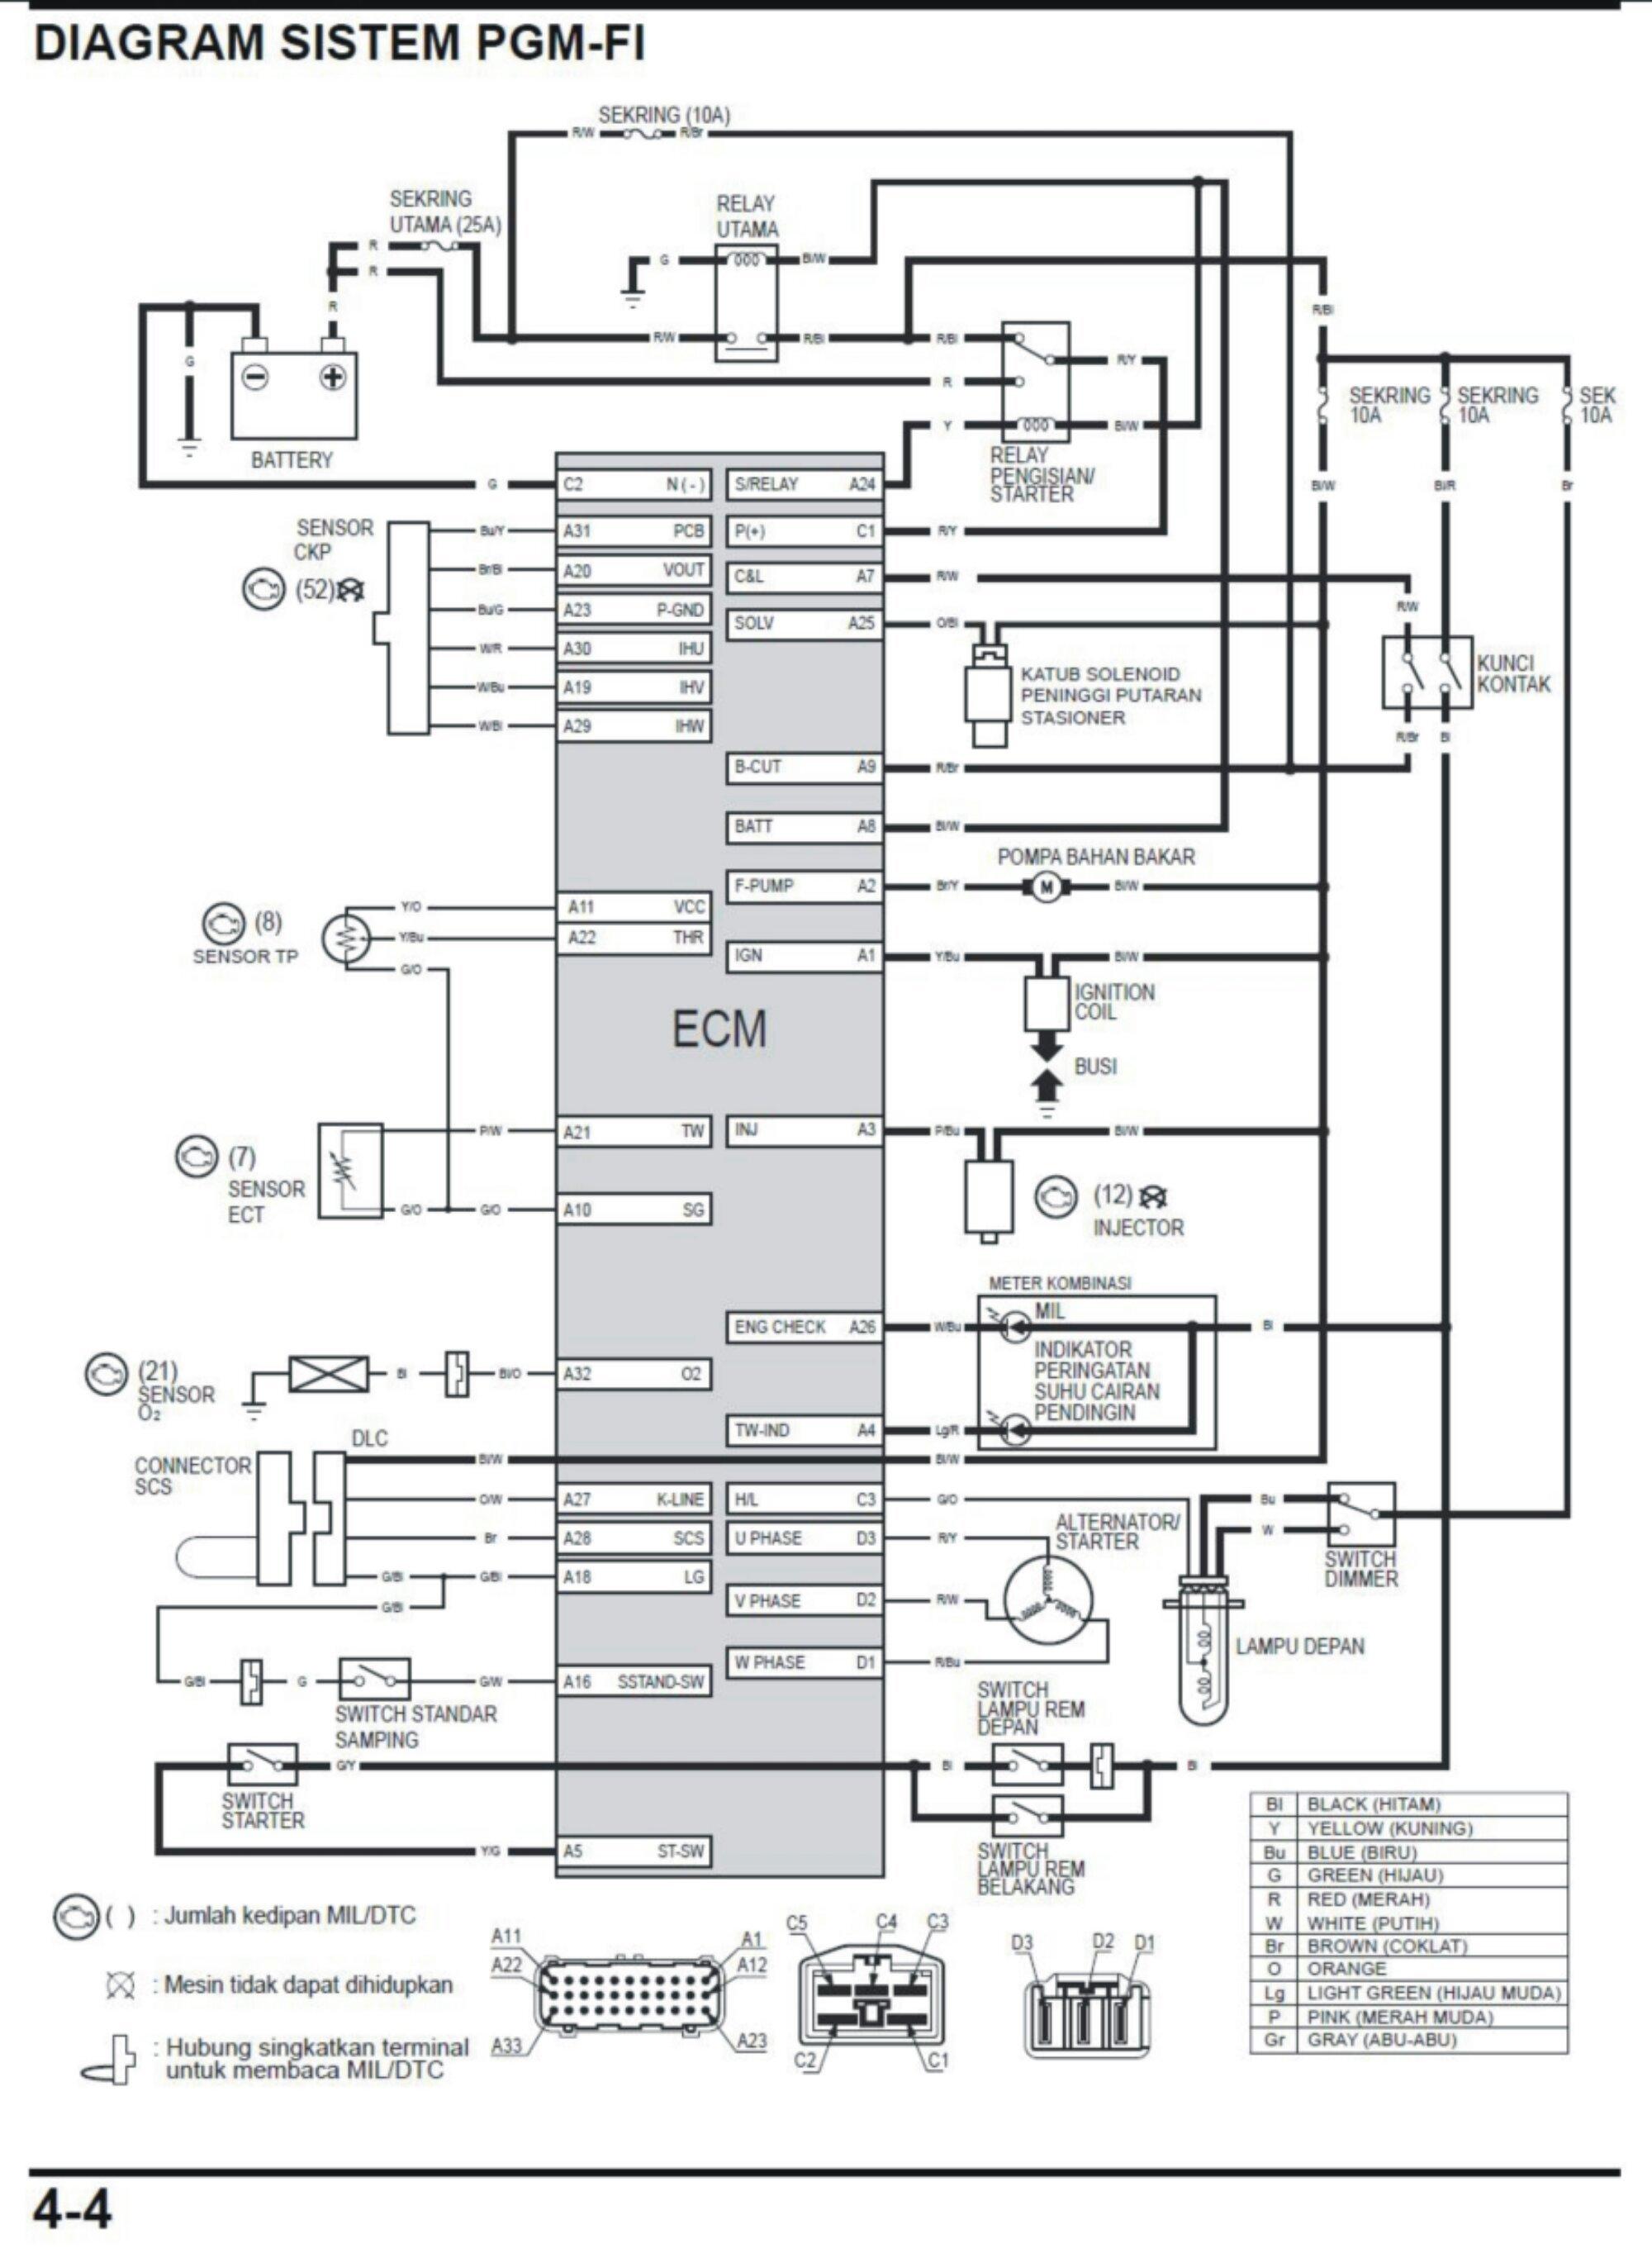 Wiring Diagram Honda Beat Injeksi Wiring Diagrams Data Company Company Ilsoleovunque It